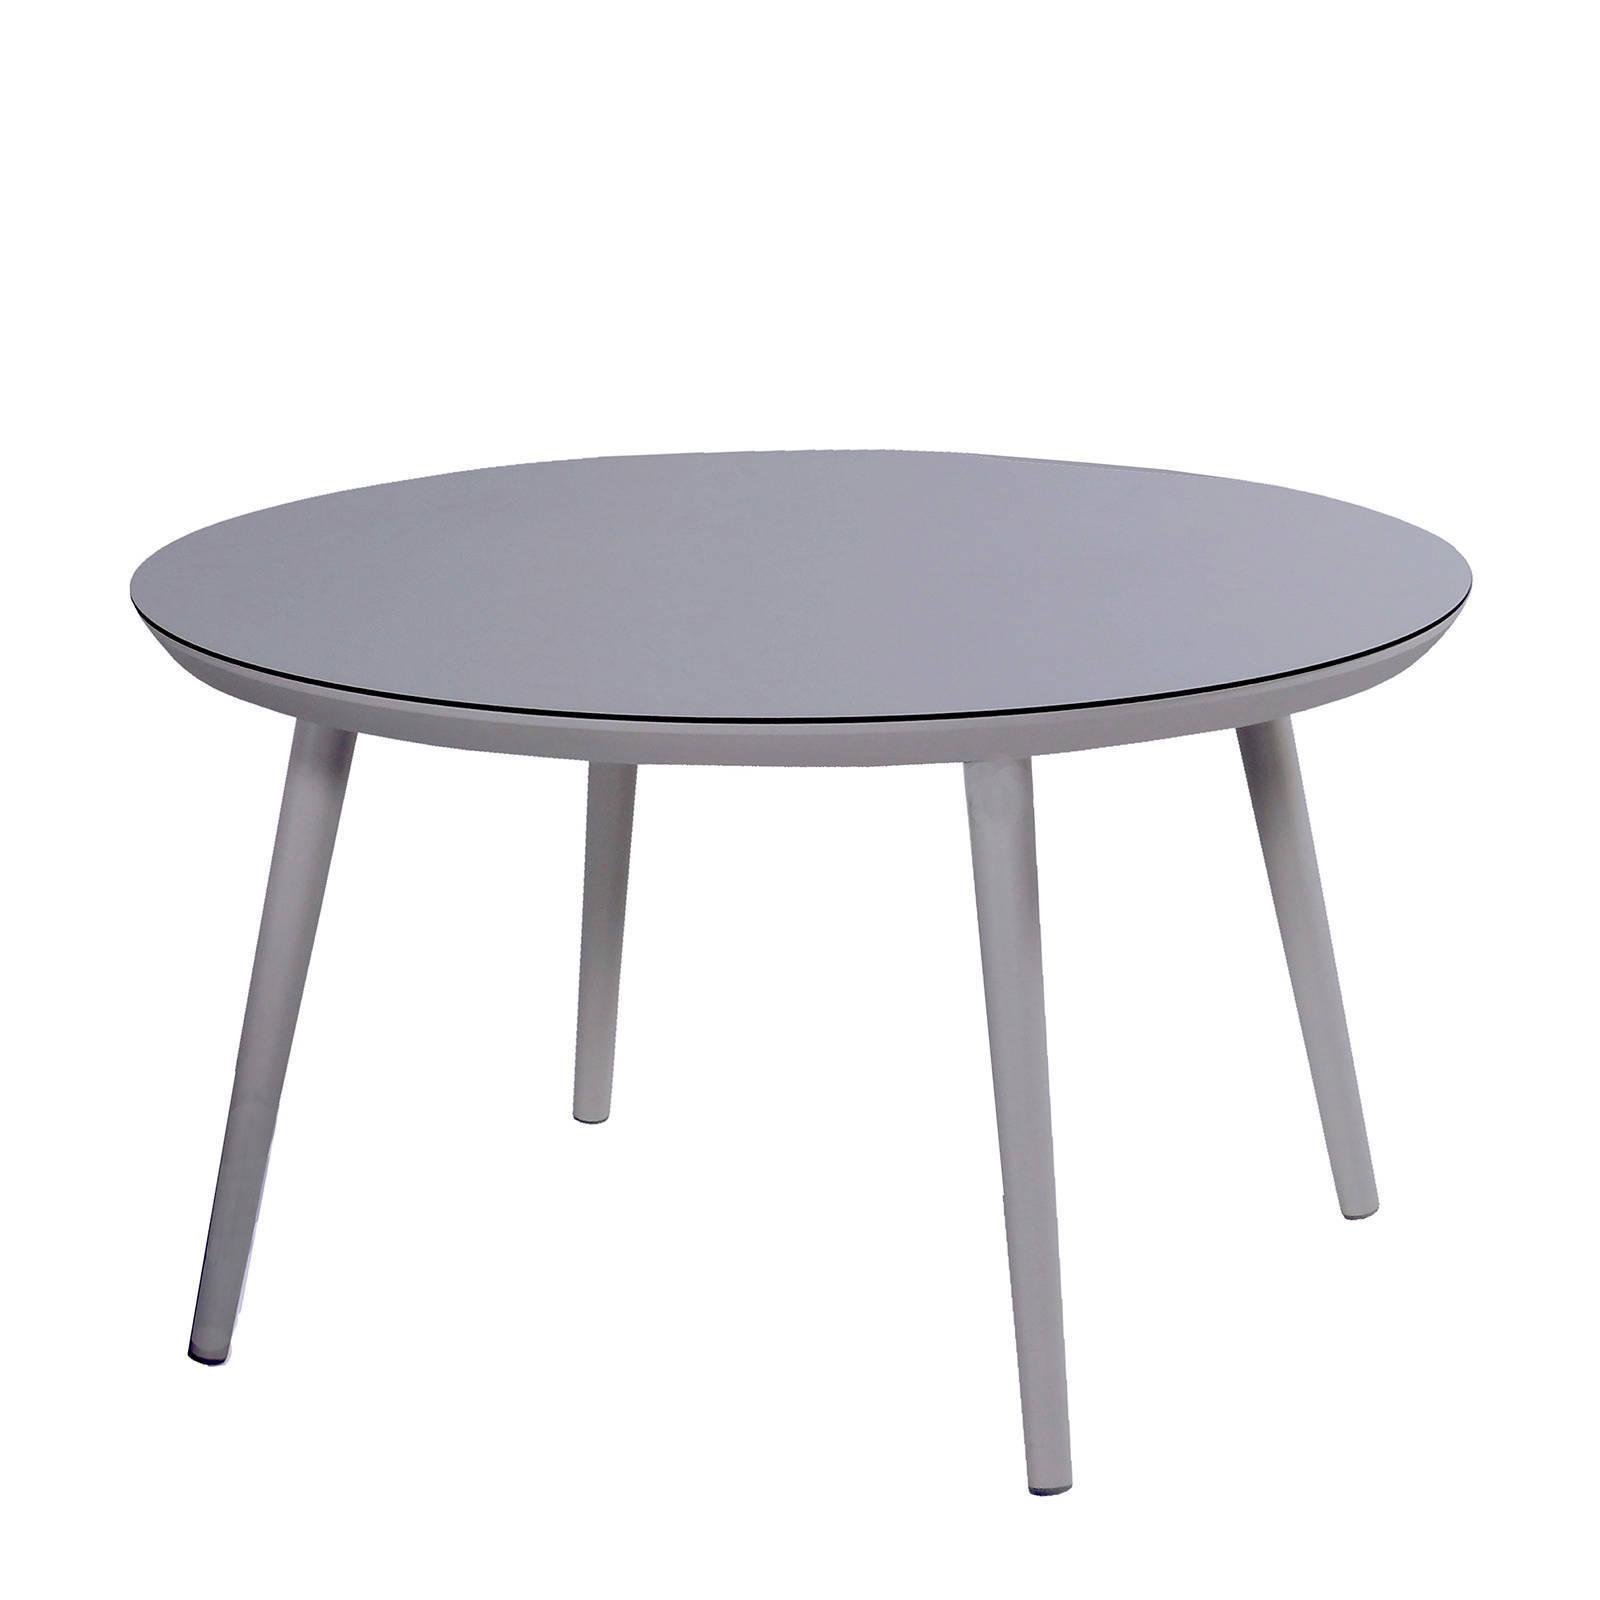 polywood tuintafel rond